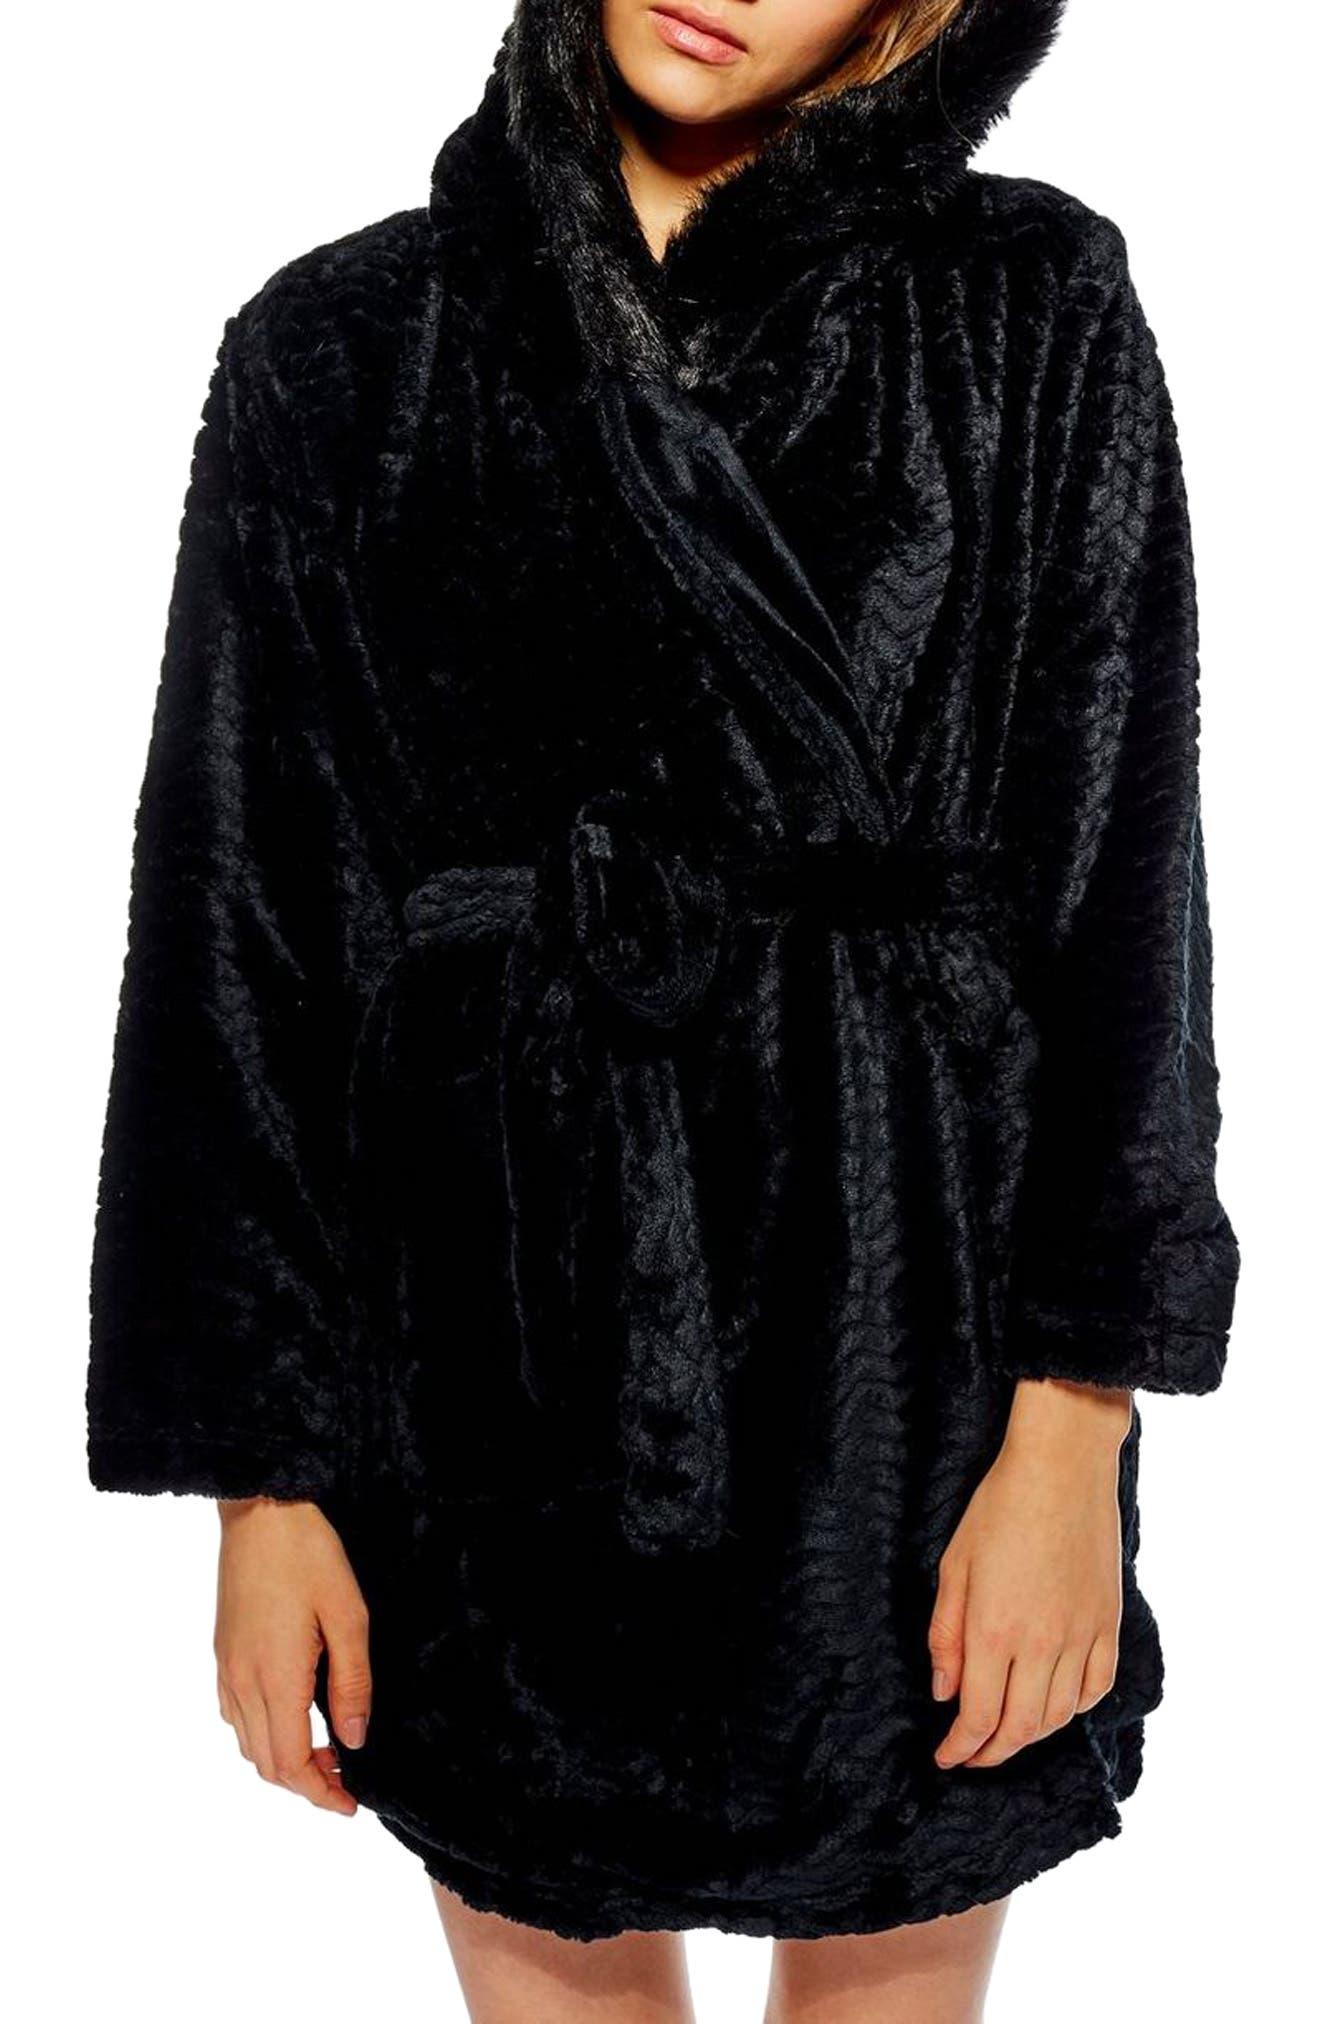 Kimmie Hooded Short Robe,                             Main thumbnail 1, color,                             BLACK